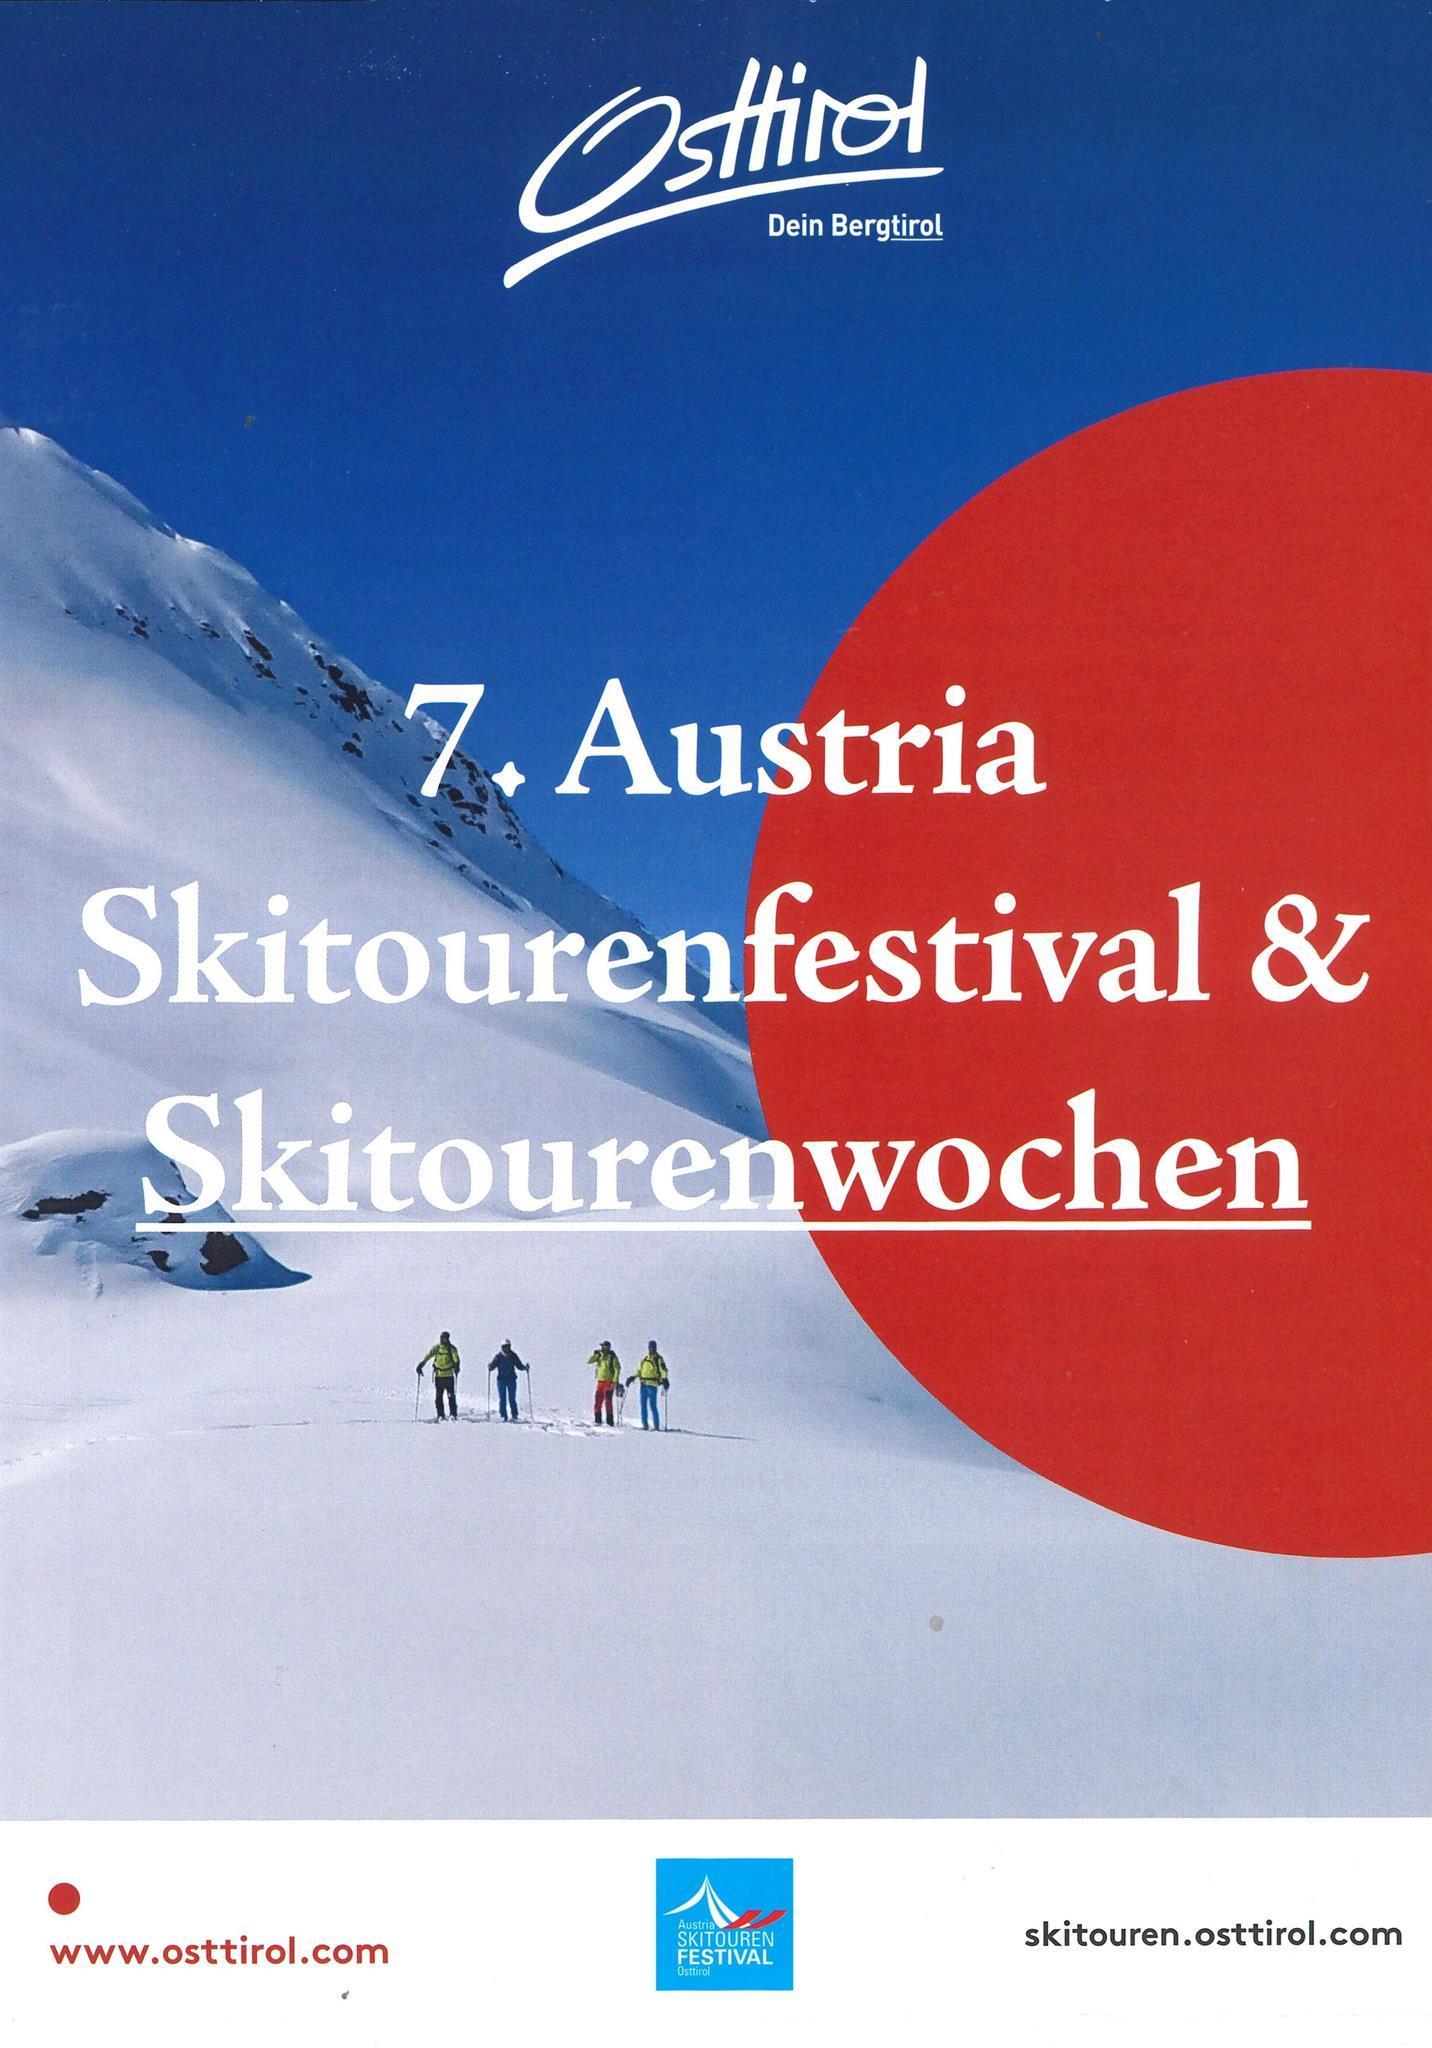 Austria-SkitourenfestivalSkitourenwoche.jpg